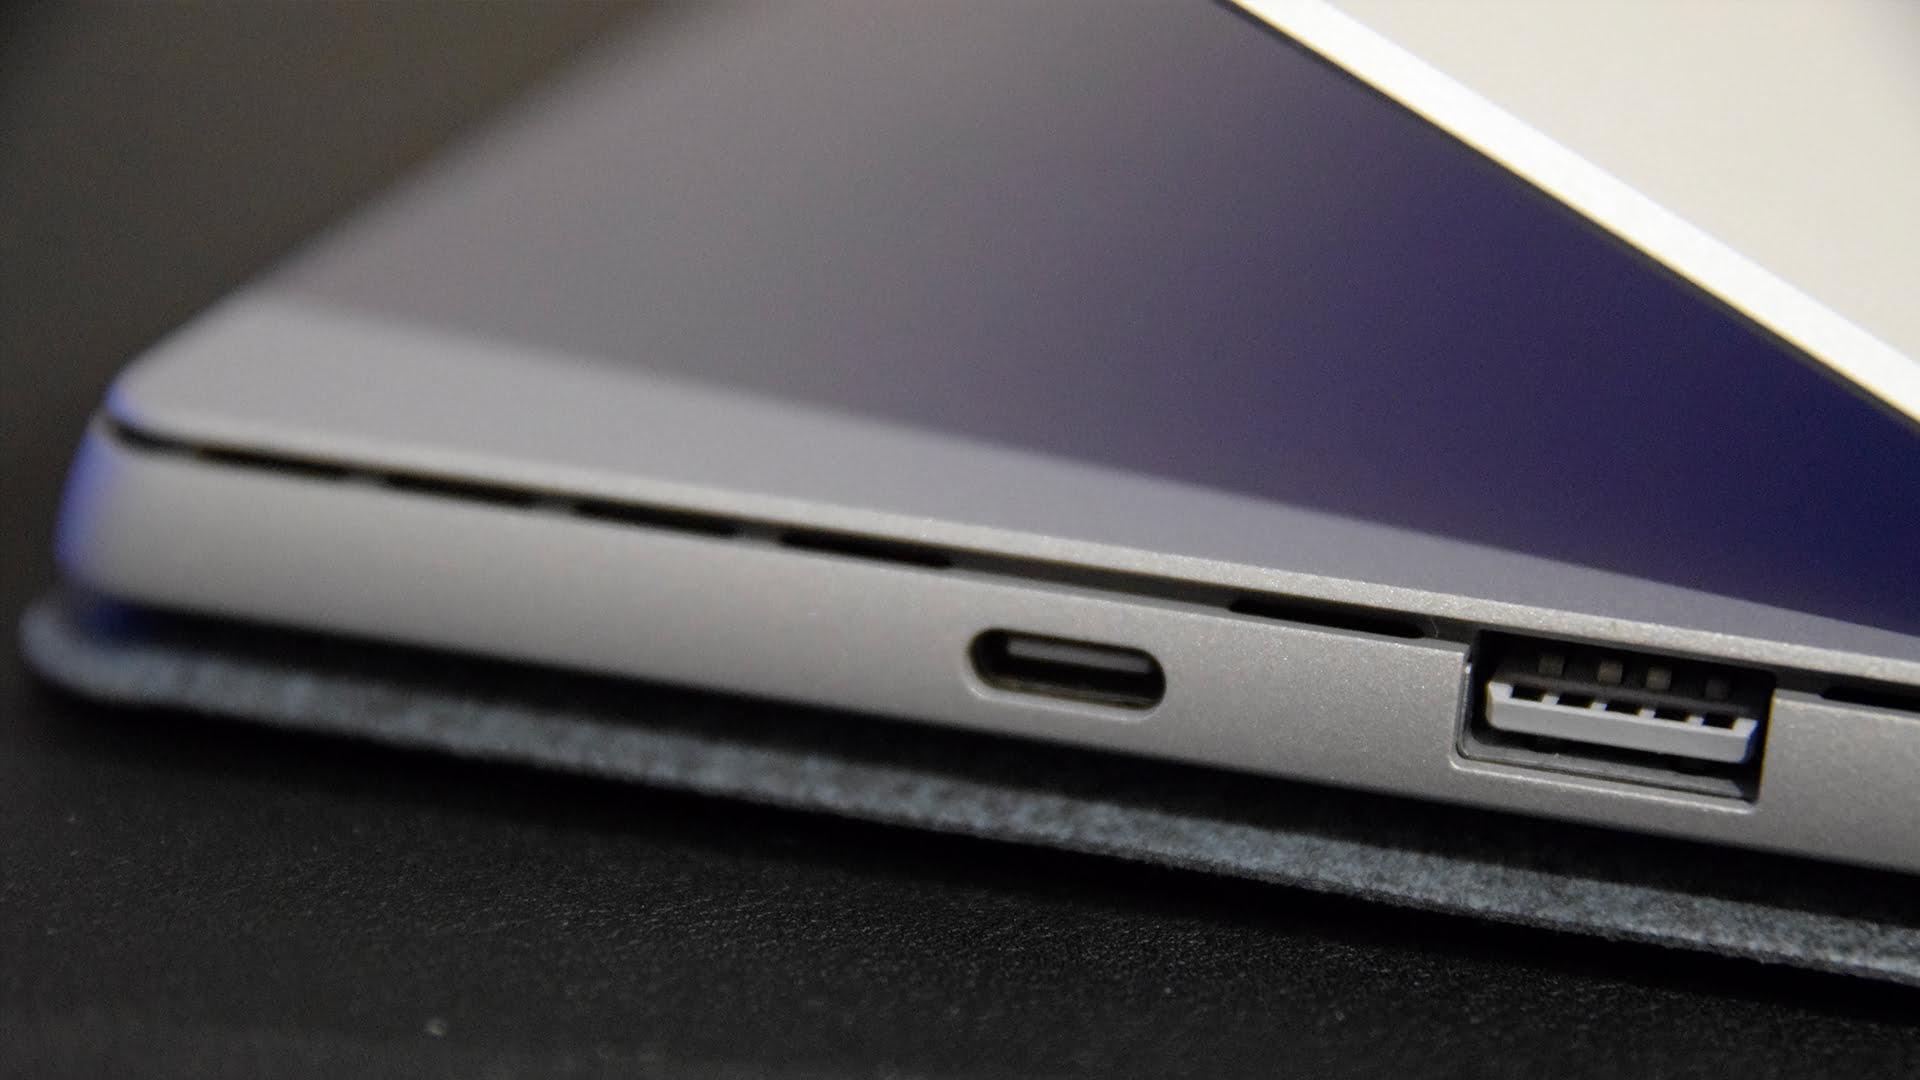 El USB C de Surface Pro 7